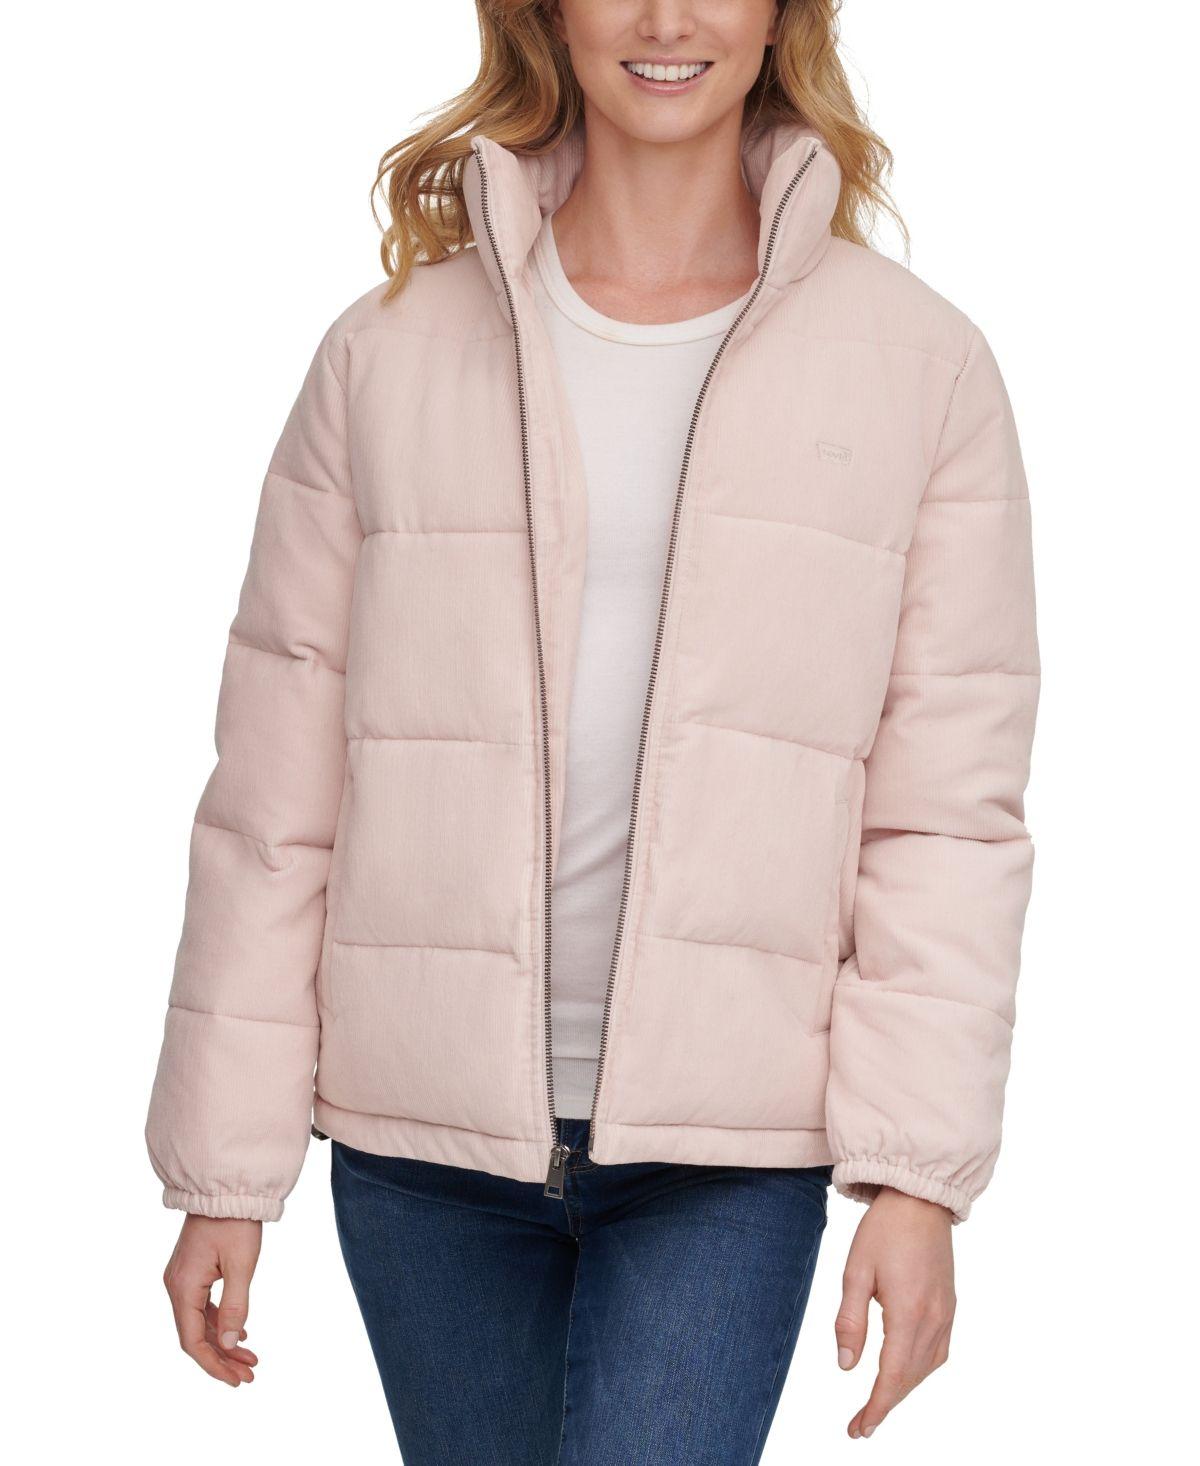 Levi S Women S Corduroy Puffer Jacket Baby Pink Corduroy Puffer Jacket Jackets Dream Clothes [ 1466 x 1200 Pixel ]